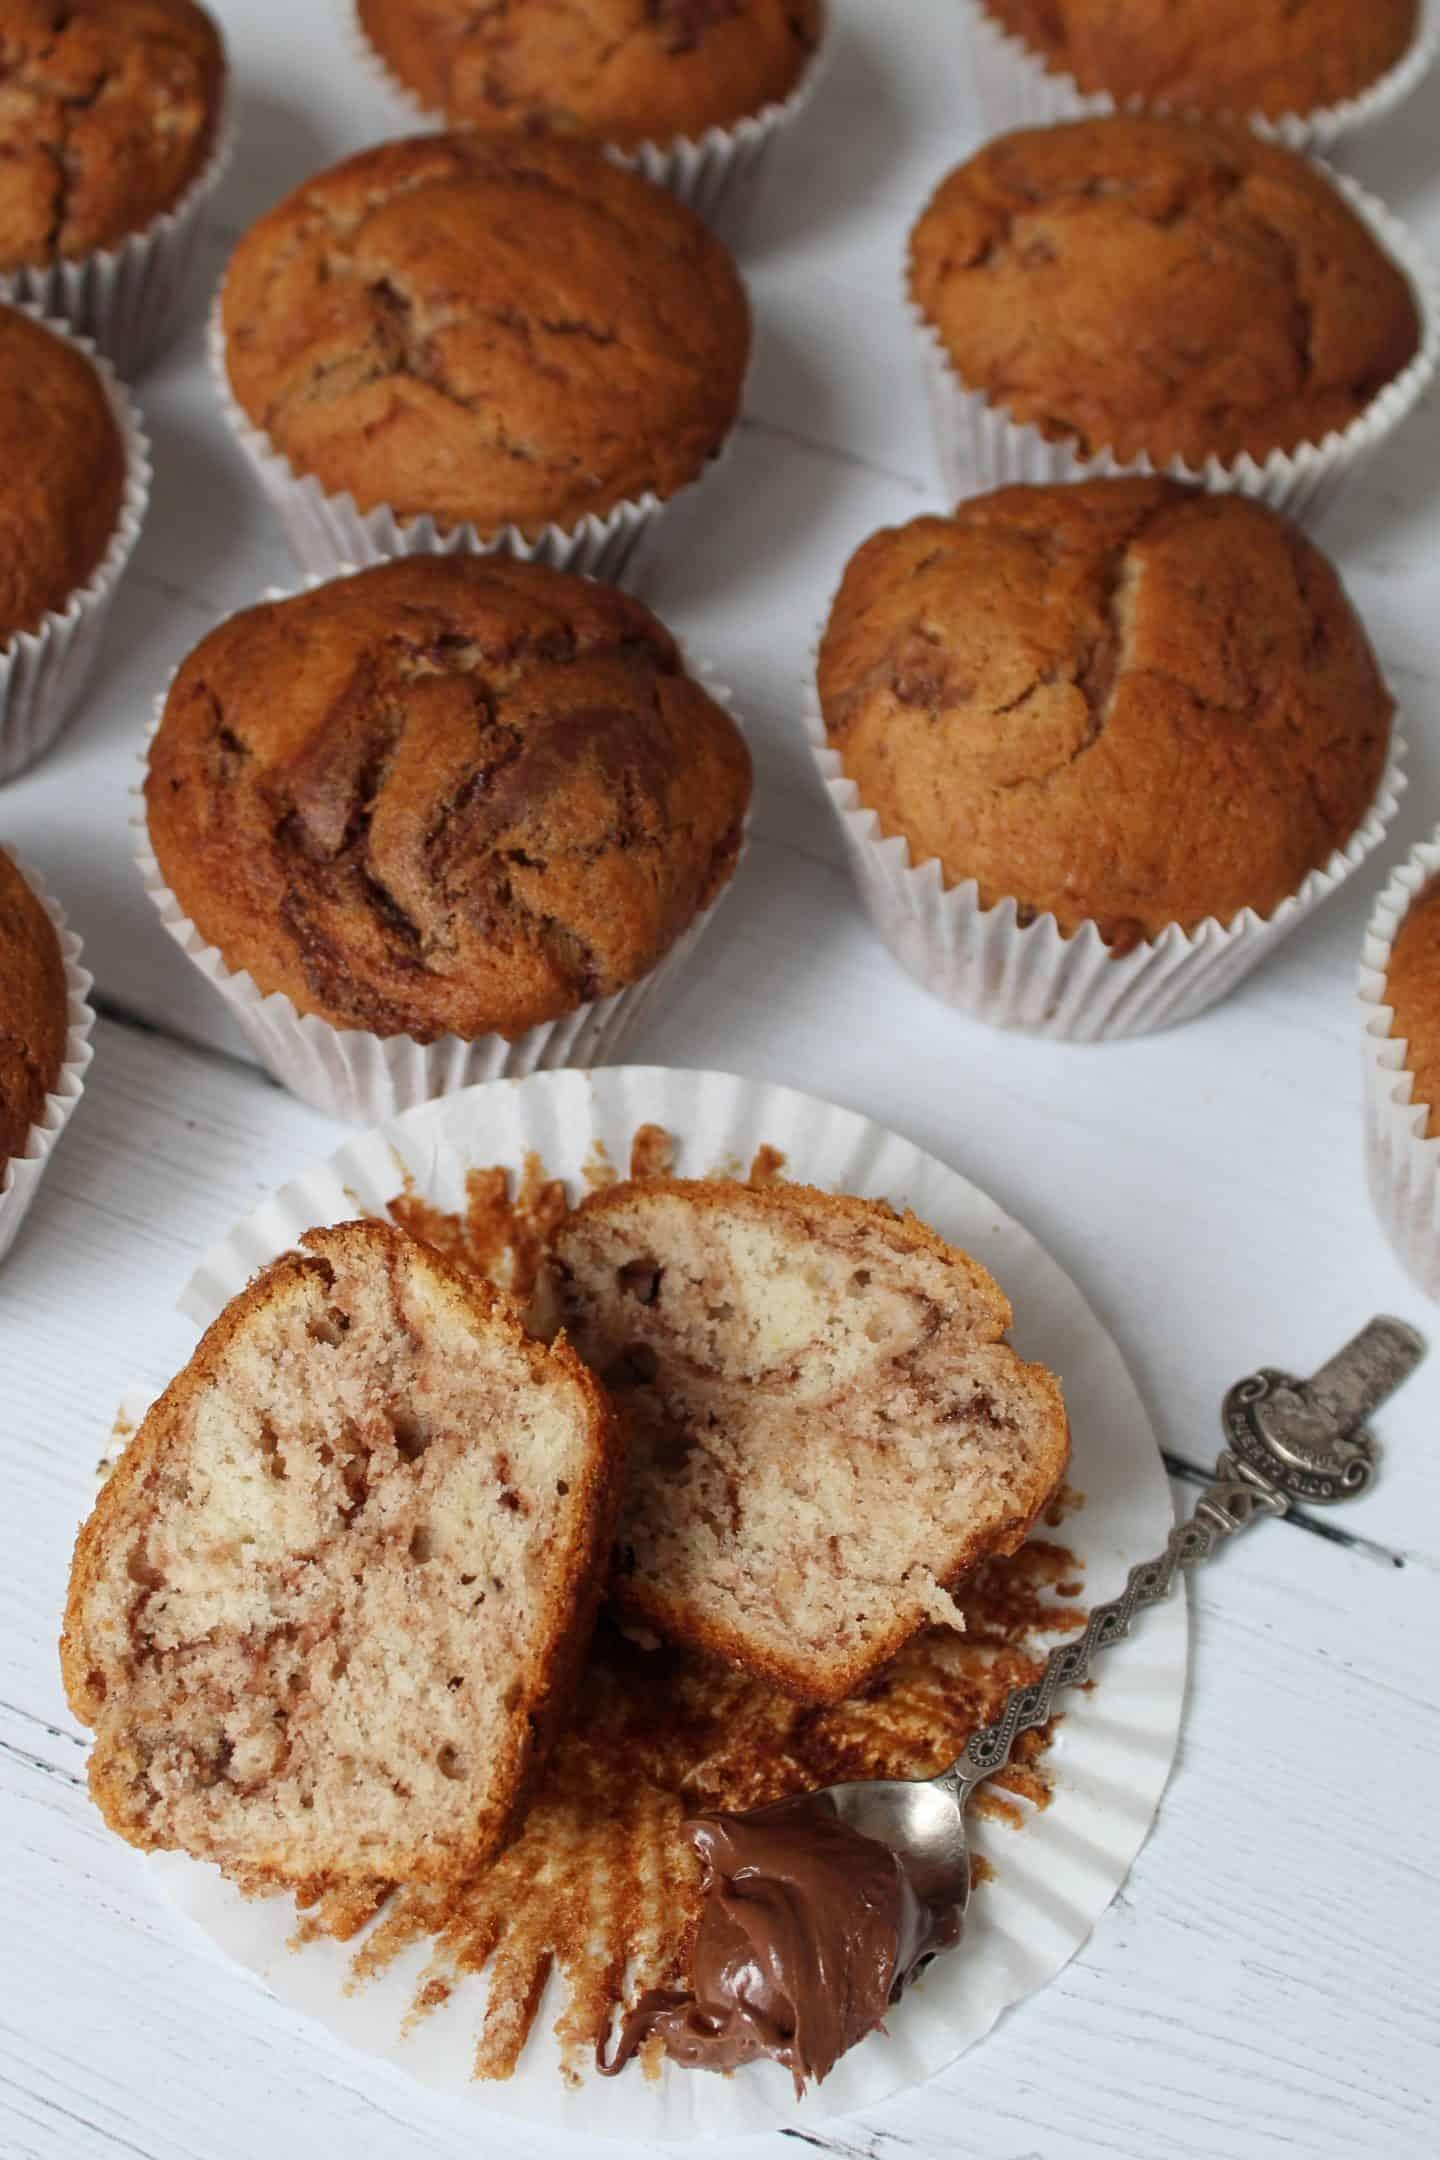 GLUTEN FREE NUTELLA BANANA MUFFINS RECIPE 145